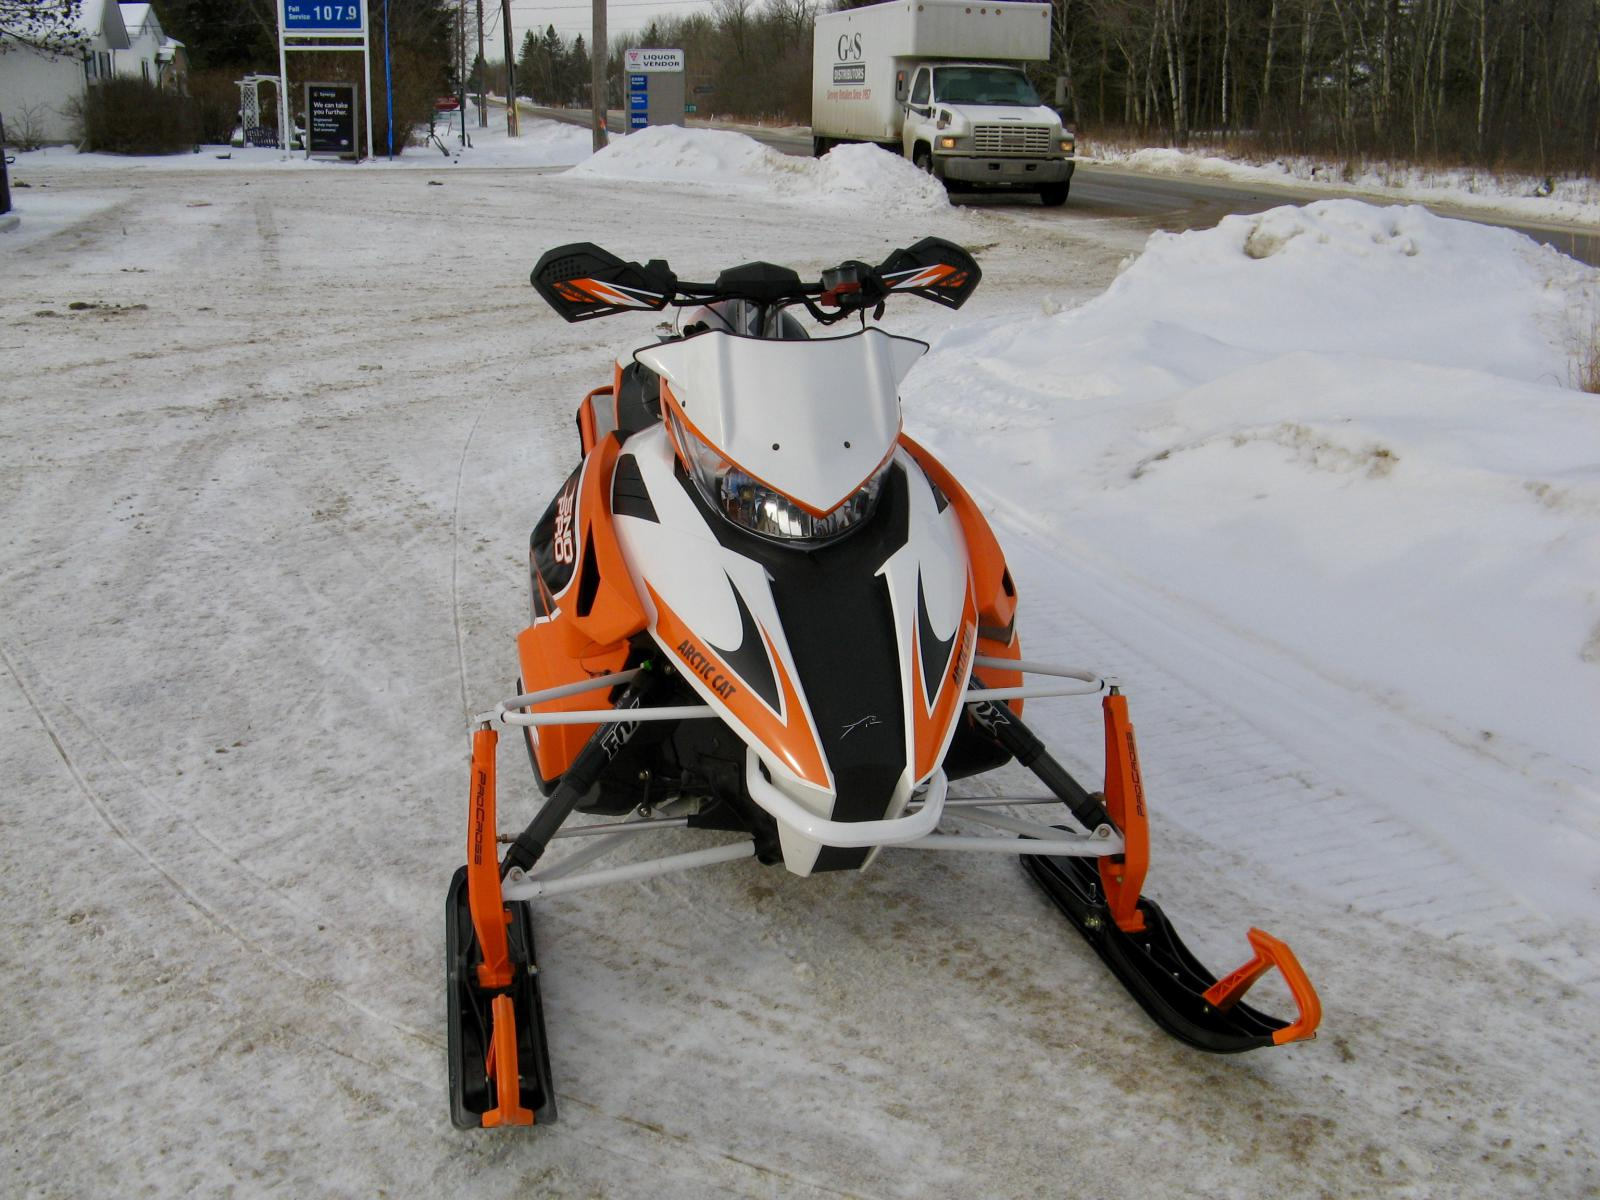 2020 or 2021 850-900cc c-tek2 dsi? - HCS Snowmobile Forums